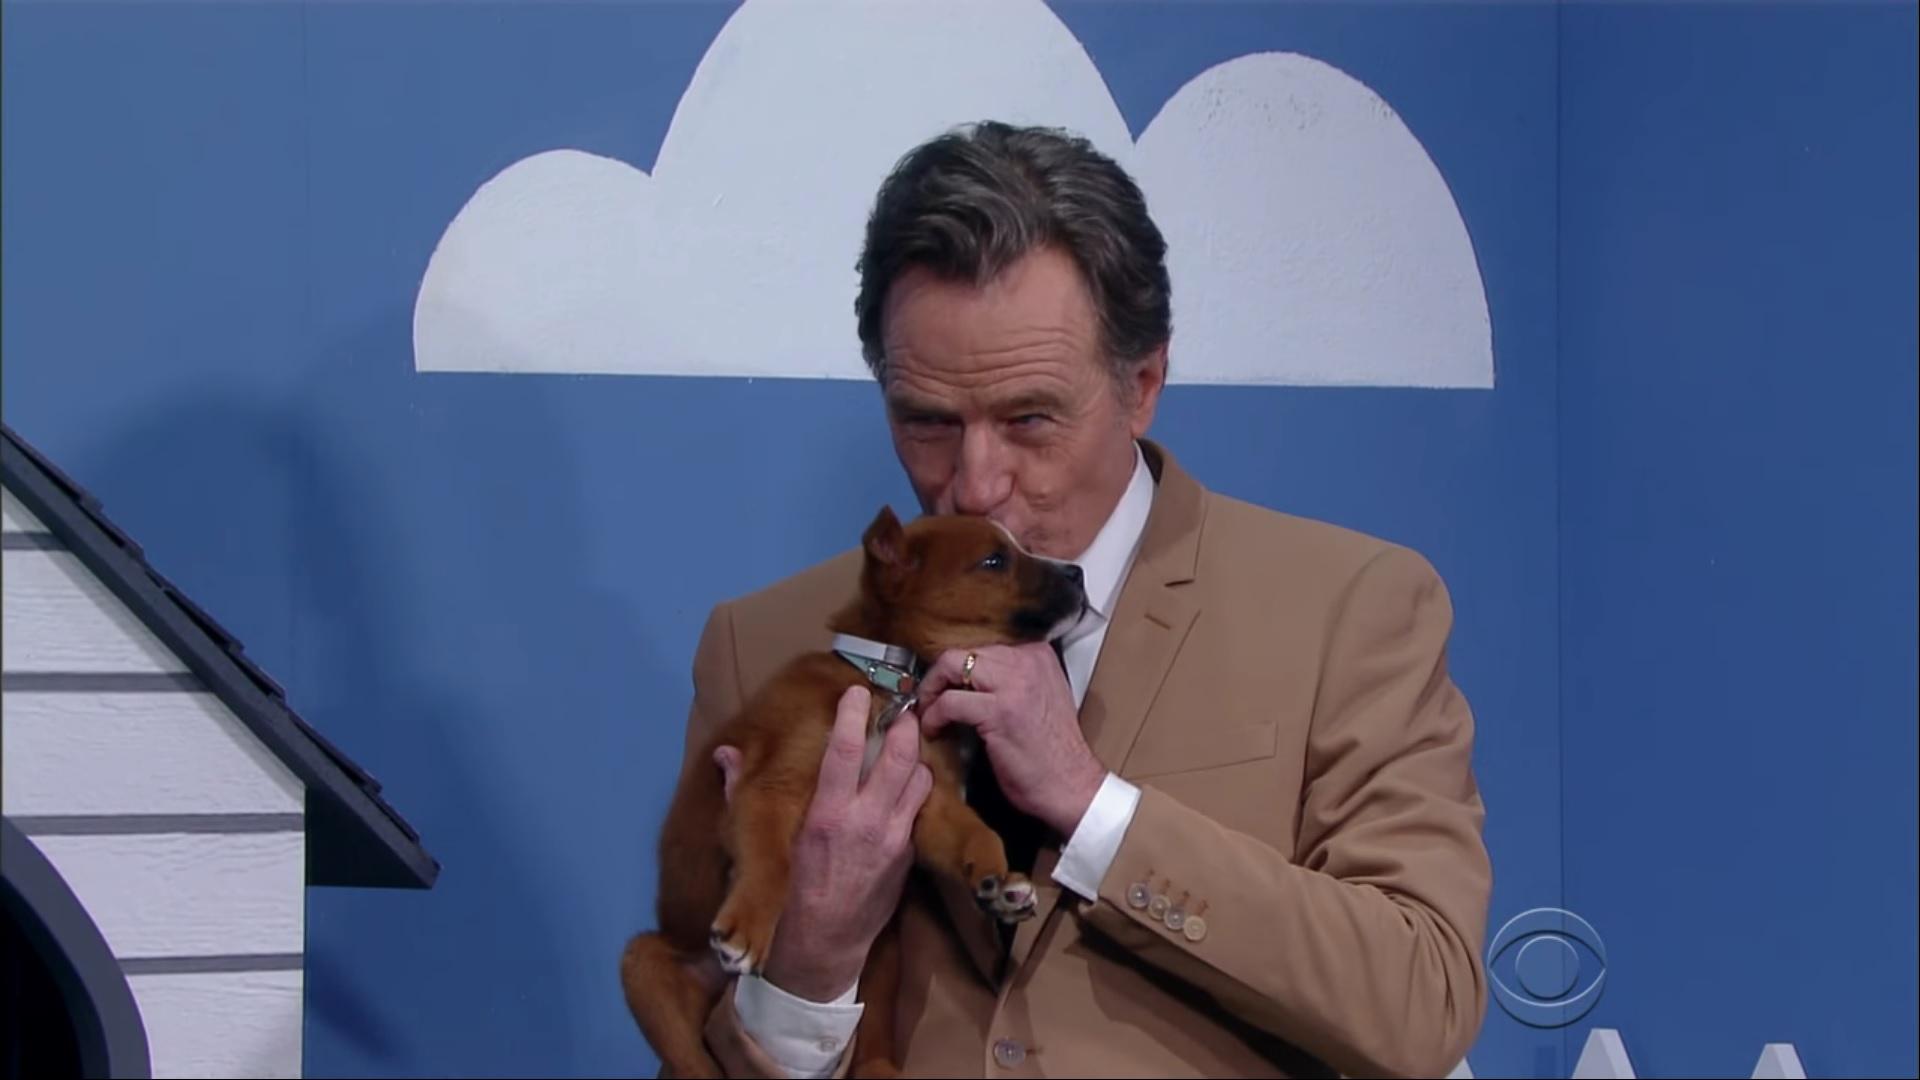 Bryan Cranston Puppies 2